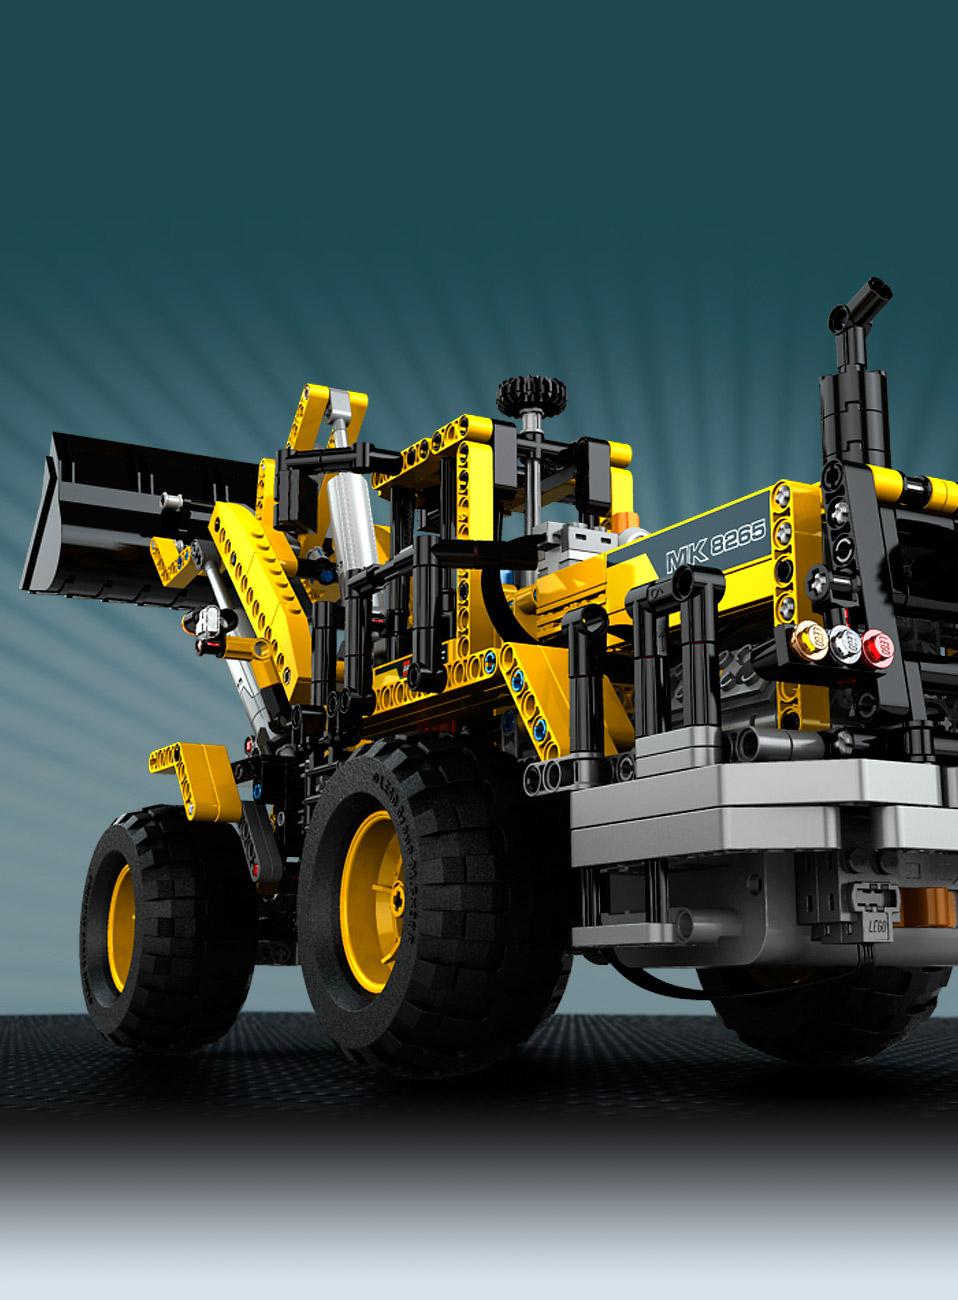 Lego technic lego lek gadgets for Mobilia webhallen